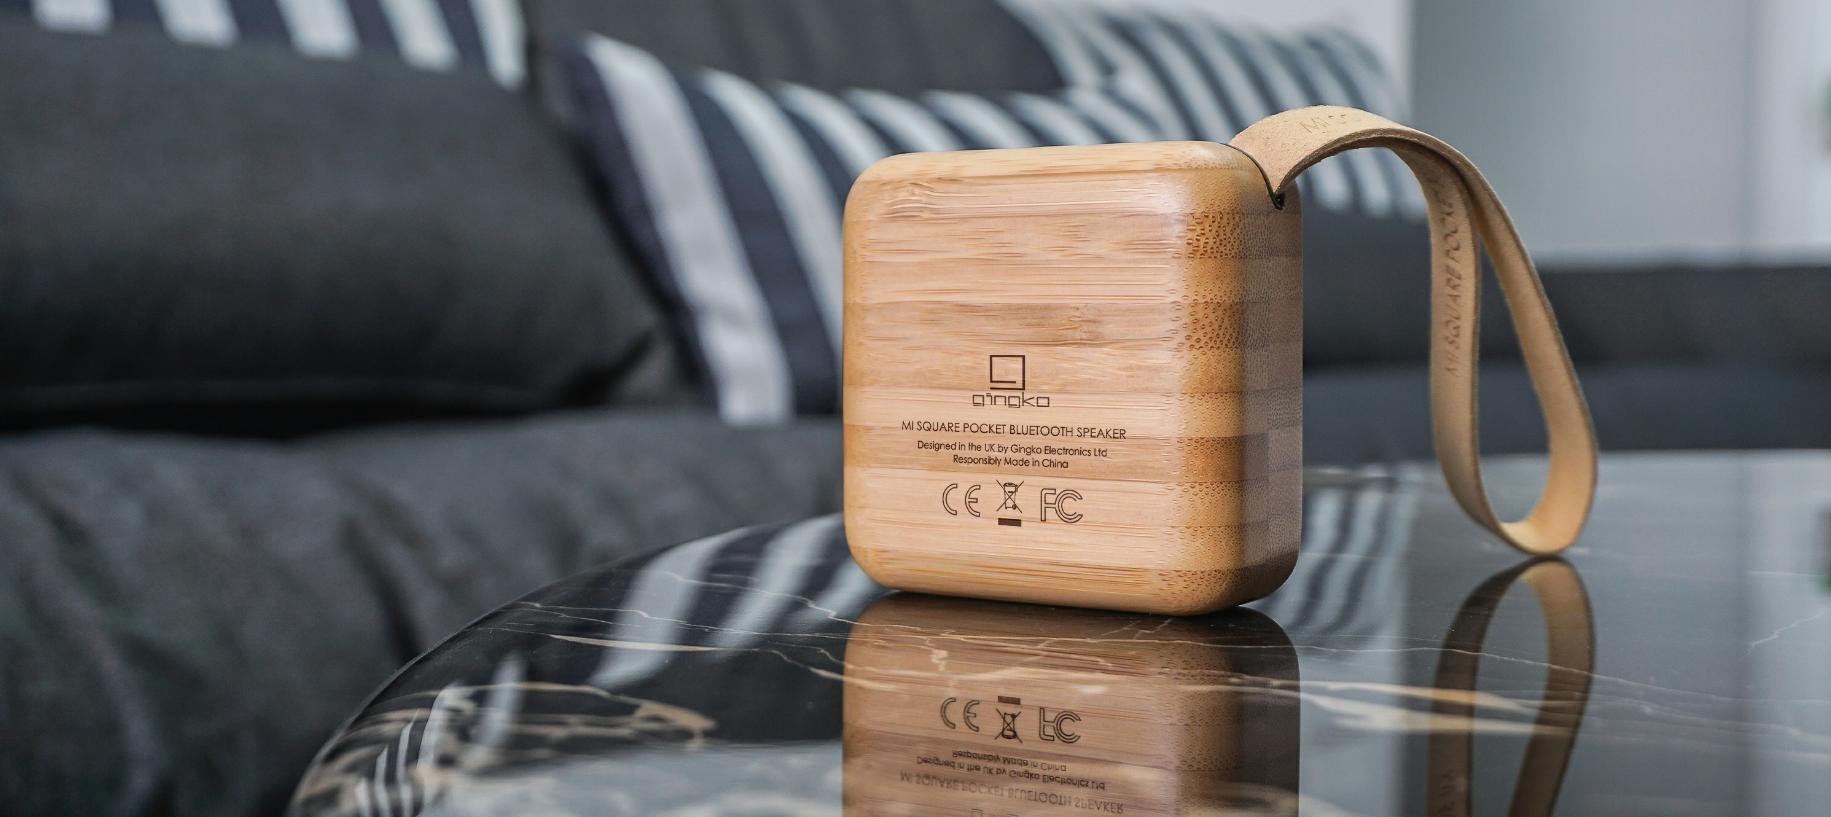 MI SQUARE Pocket Speaker Bamboo Design Essentials Gingko